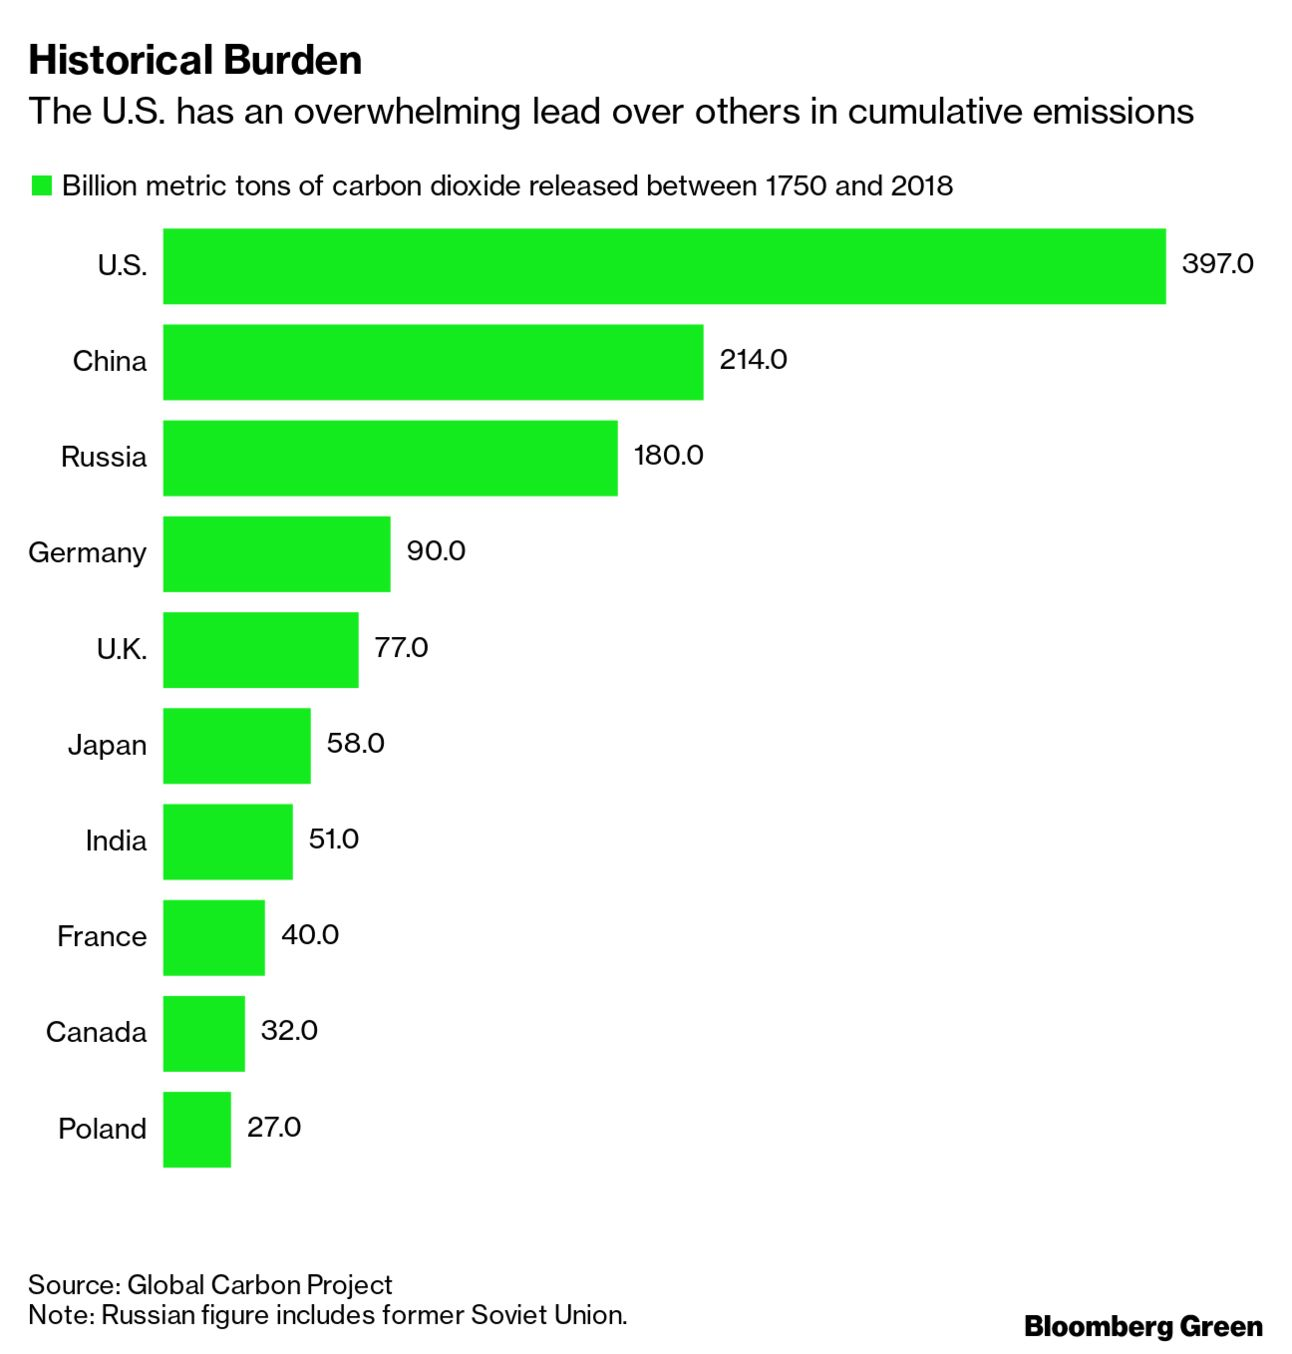 Historical Burden